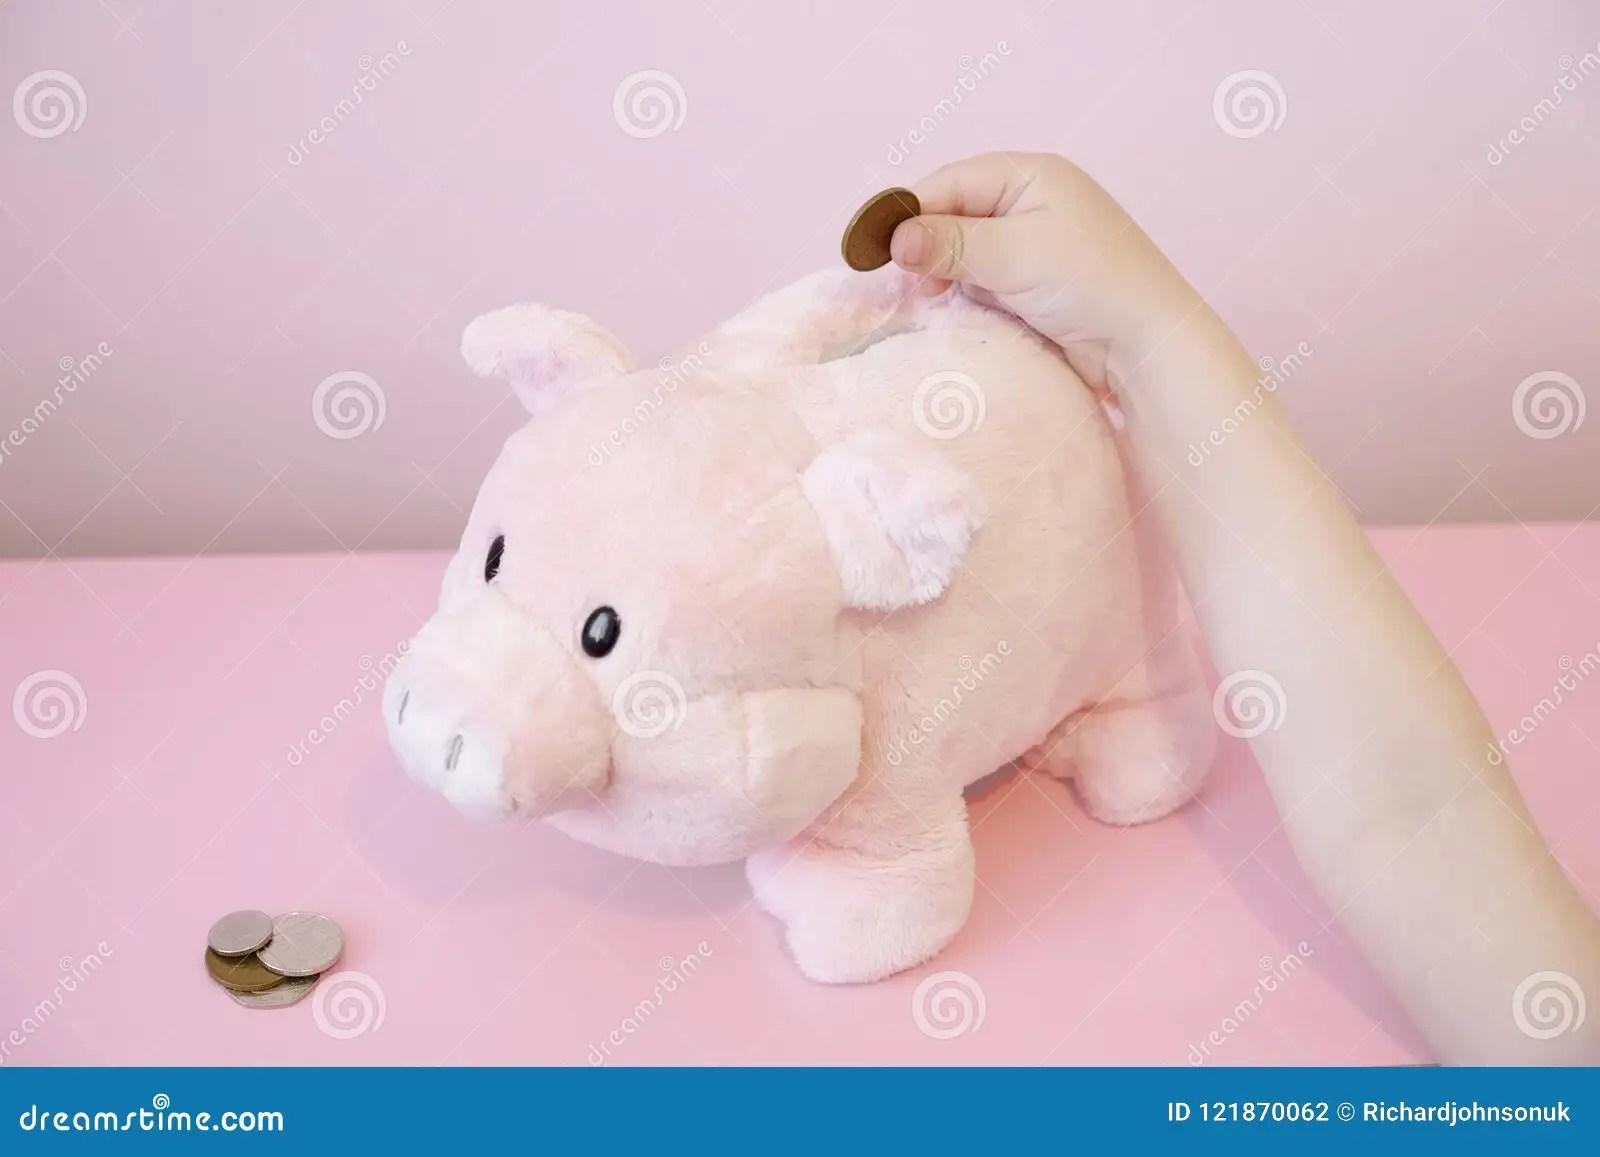 Piggy Bank Savings Childs Hand Coins Kids Money Trust Fund